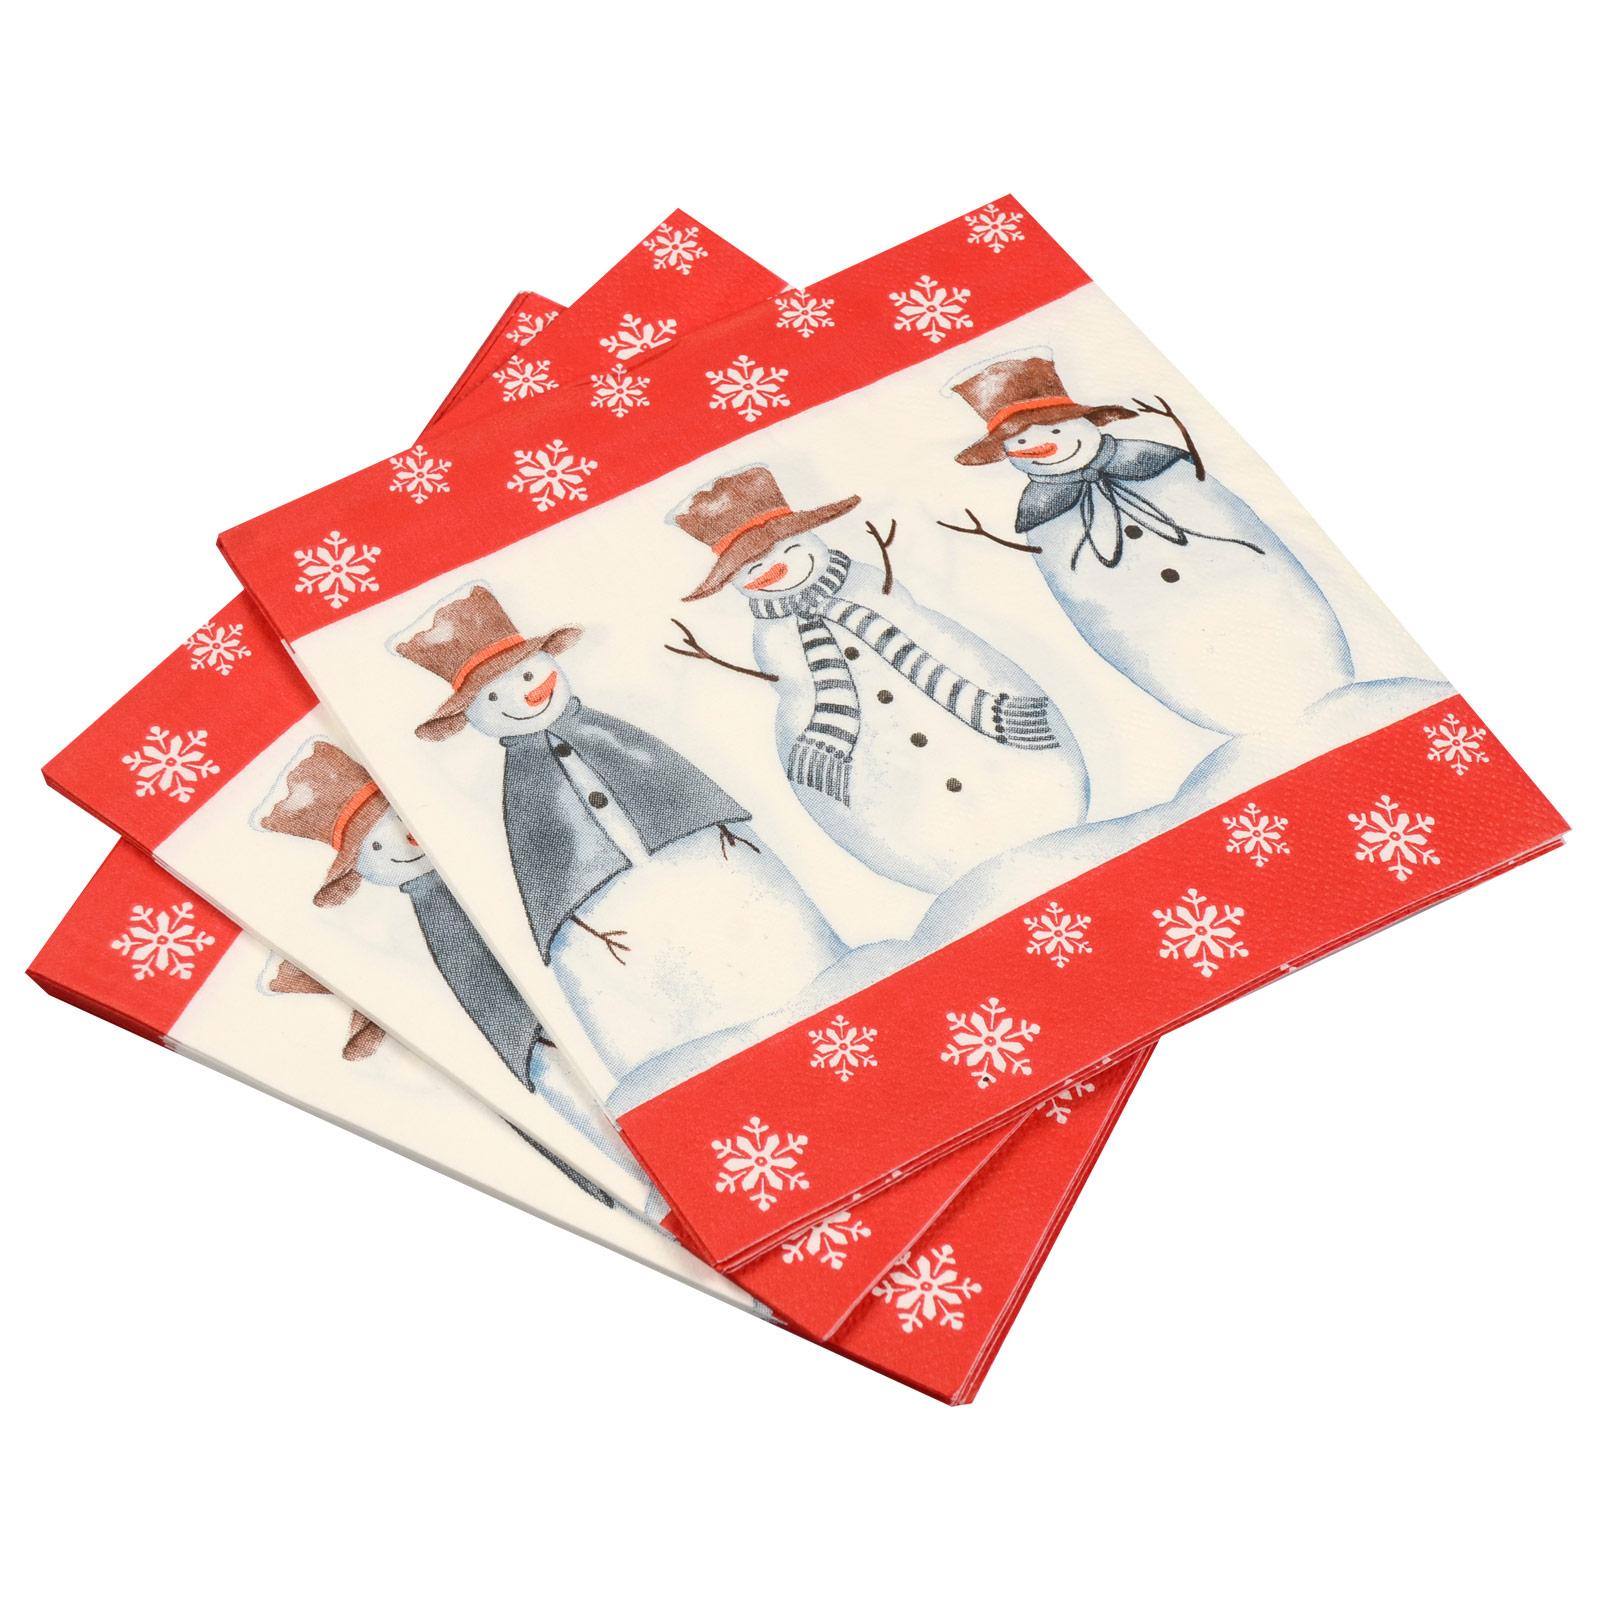 3-Ply-Square-Disposable-Paper-Napkins-Serviettes-Party-Tableware-30-Designs